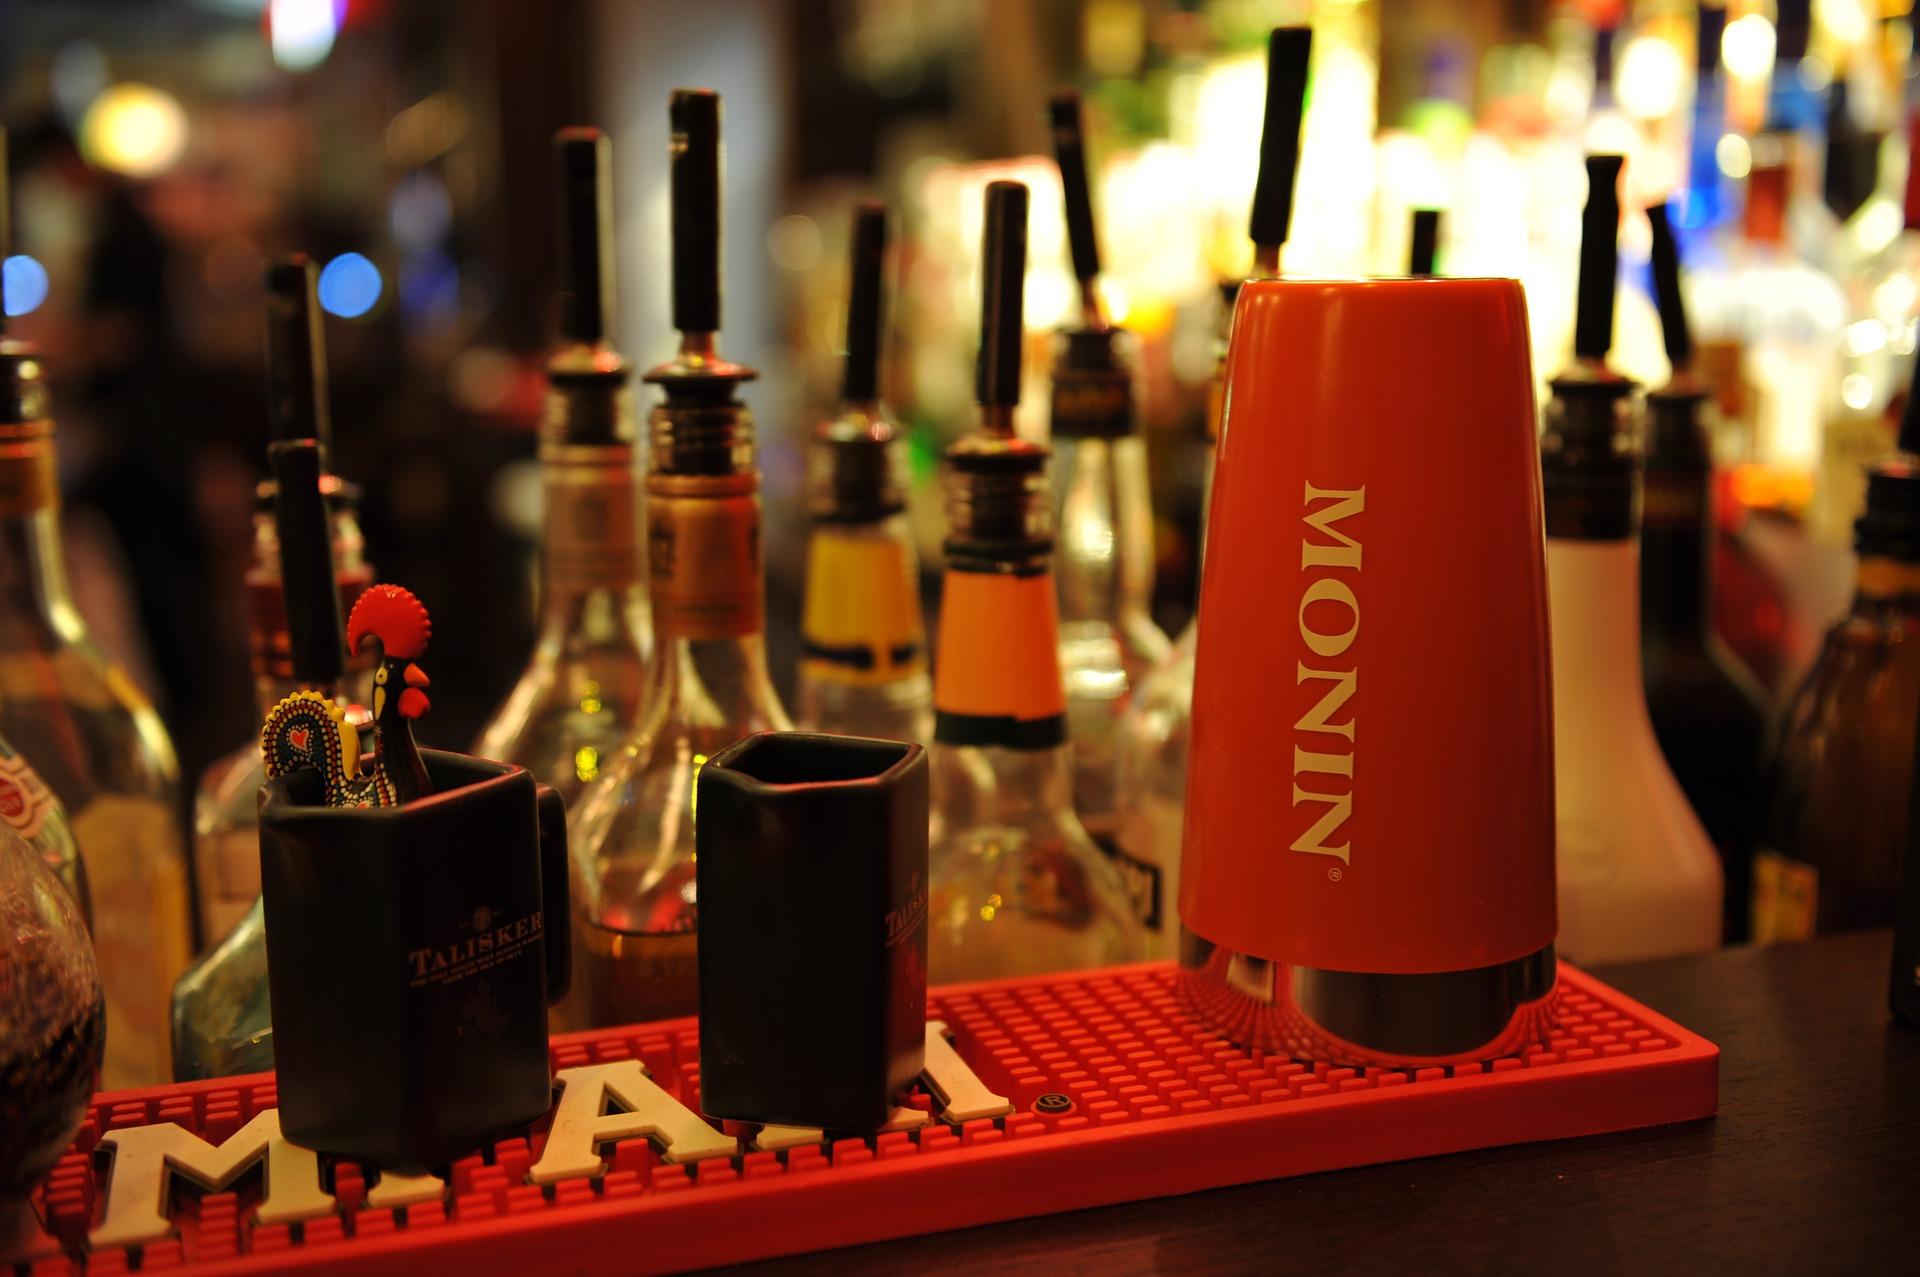 The 10 Best Bars In Jaipur, India